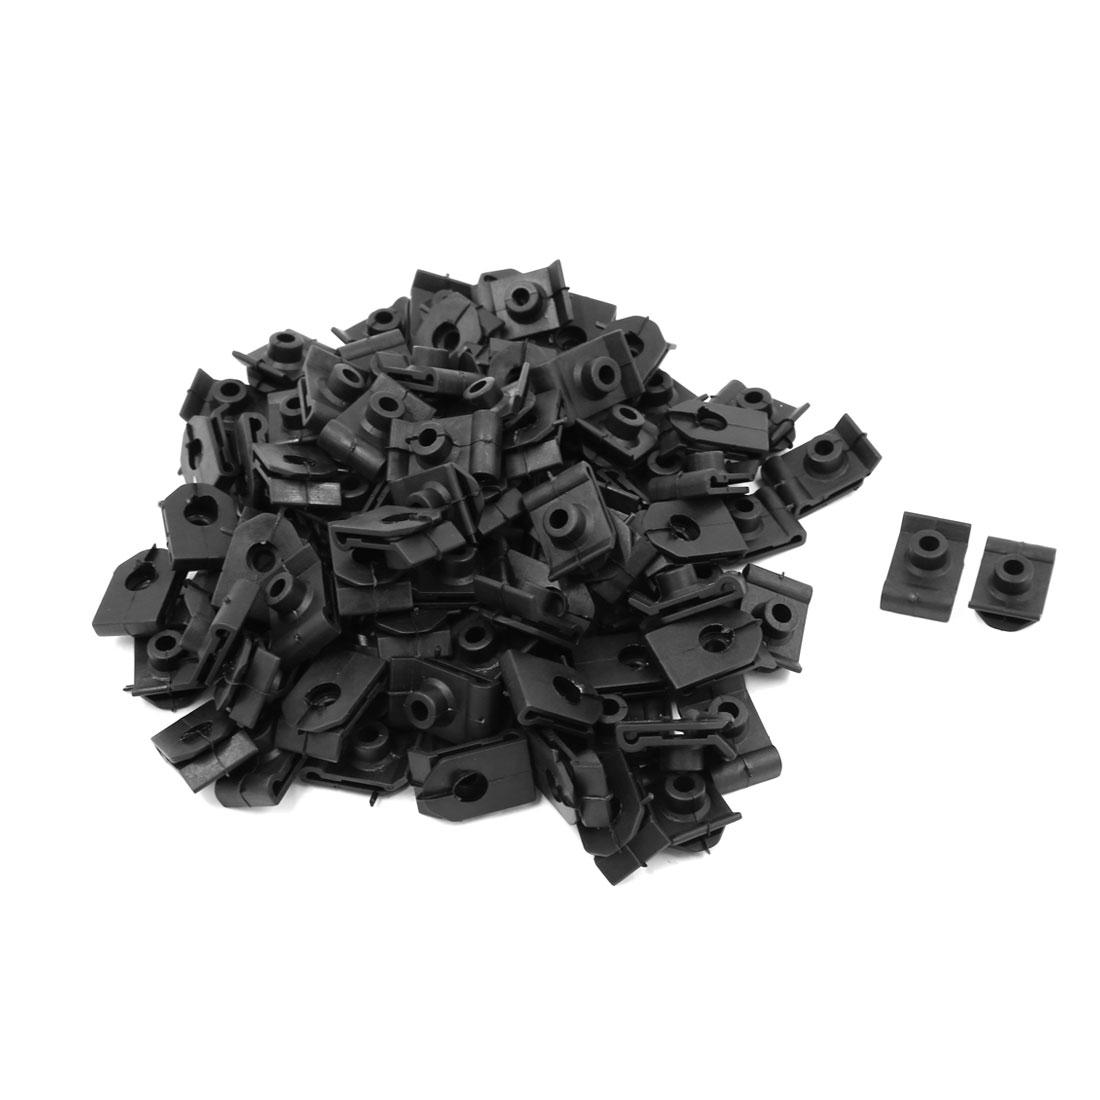 Car 10mm Hole Dia Black Plastic Rivets Fastener Fender Panel Fixing Clips 100 Pcs